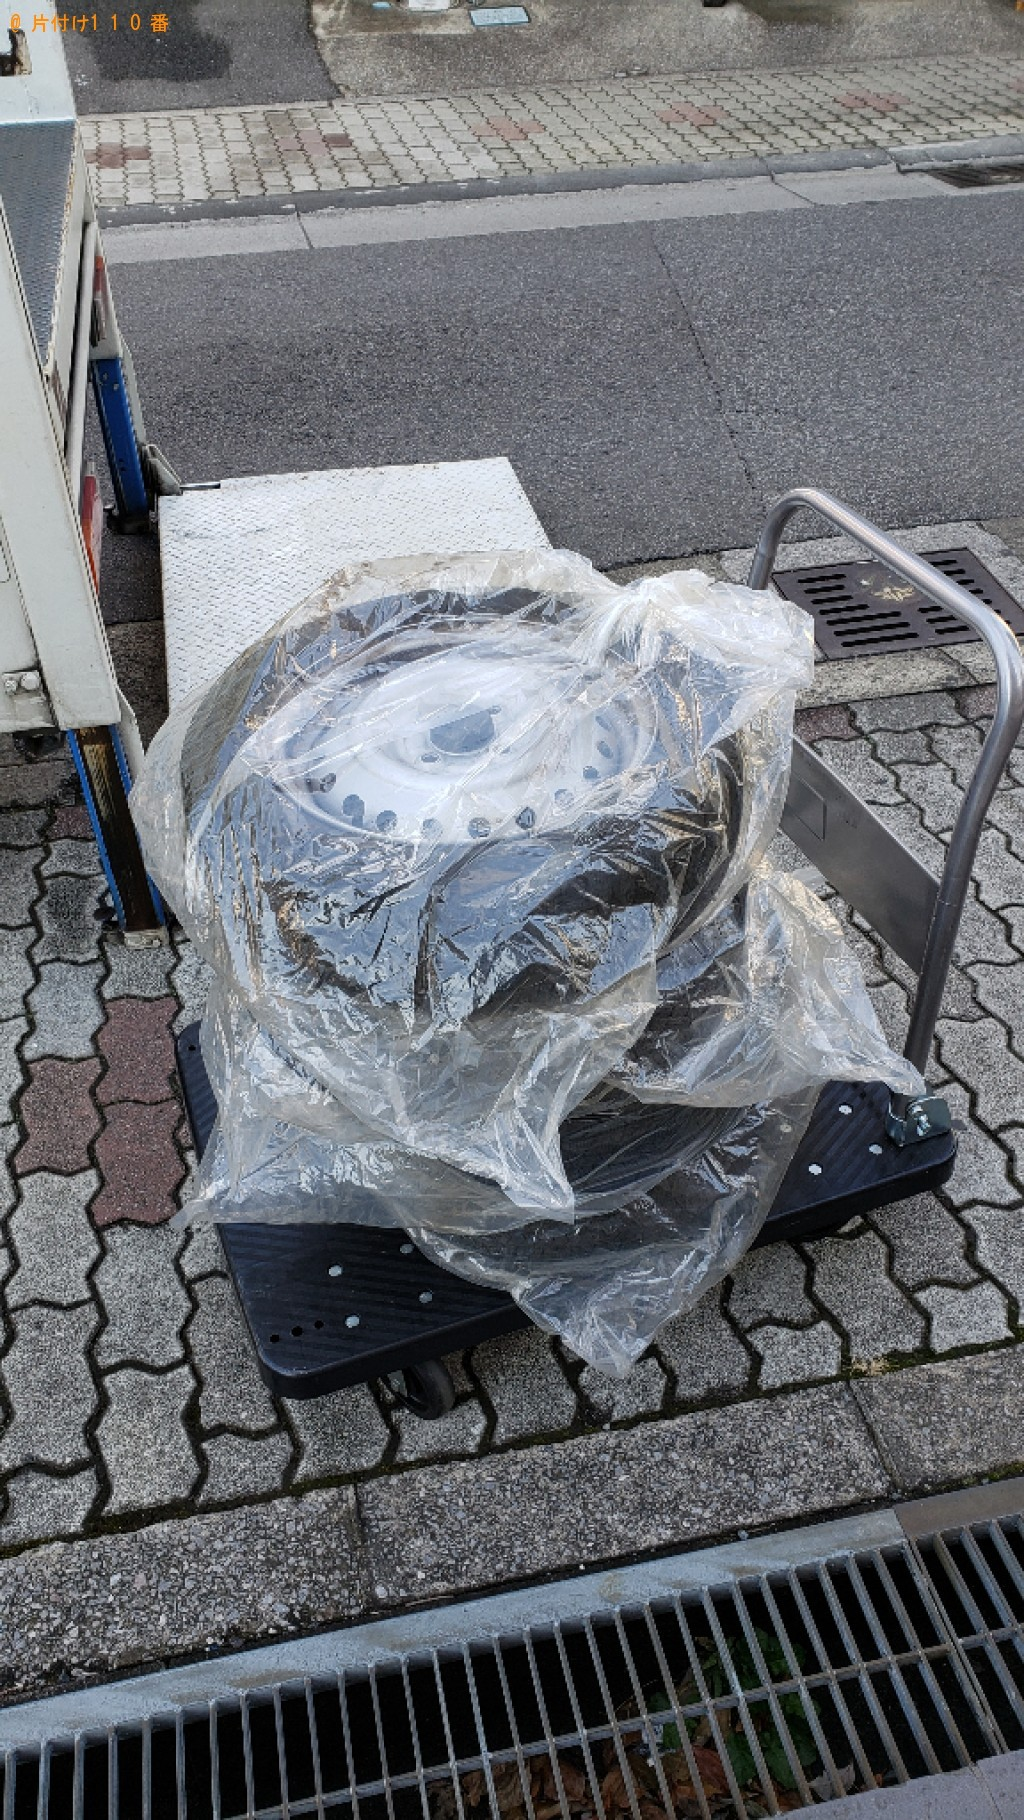 【川口市栄町】自動車タイヤの出張不用品回収・処分ご依頼